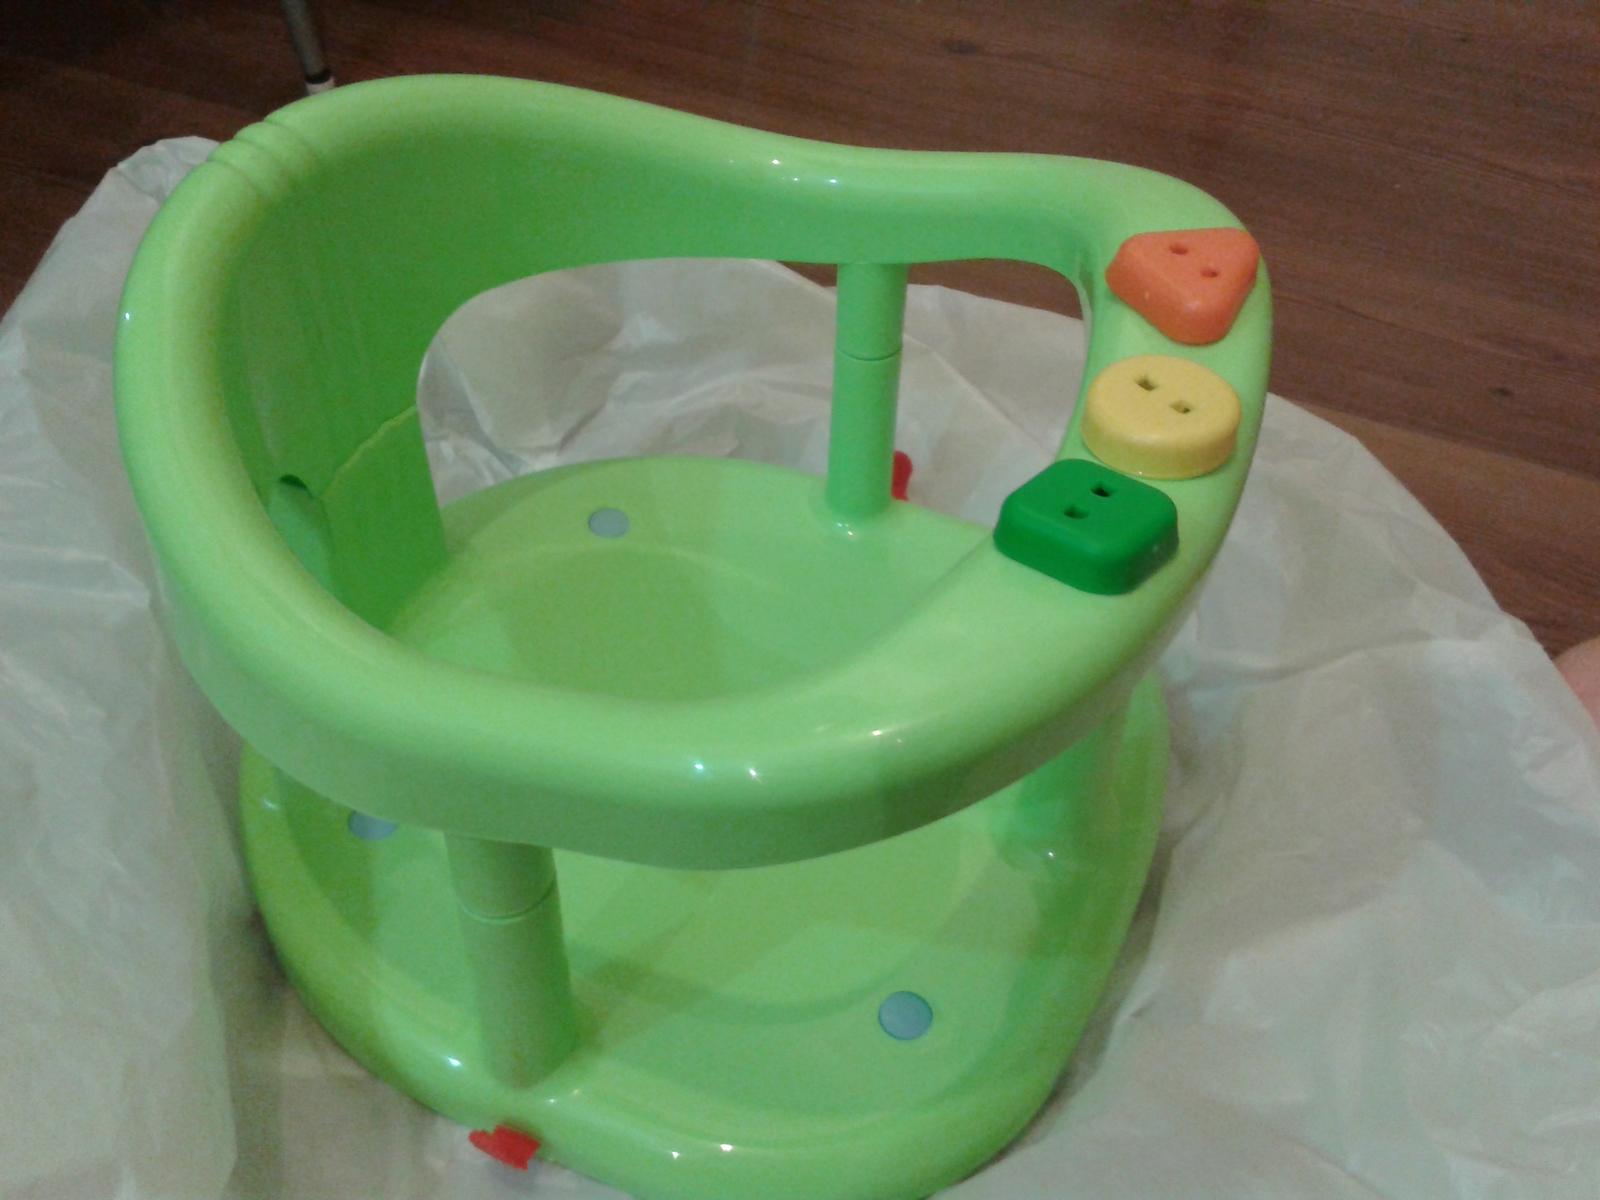 baby safe bath tub ring safety anti slip seat chair infant. Black Bedroom Furniture Sets. Home Design Ideas